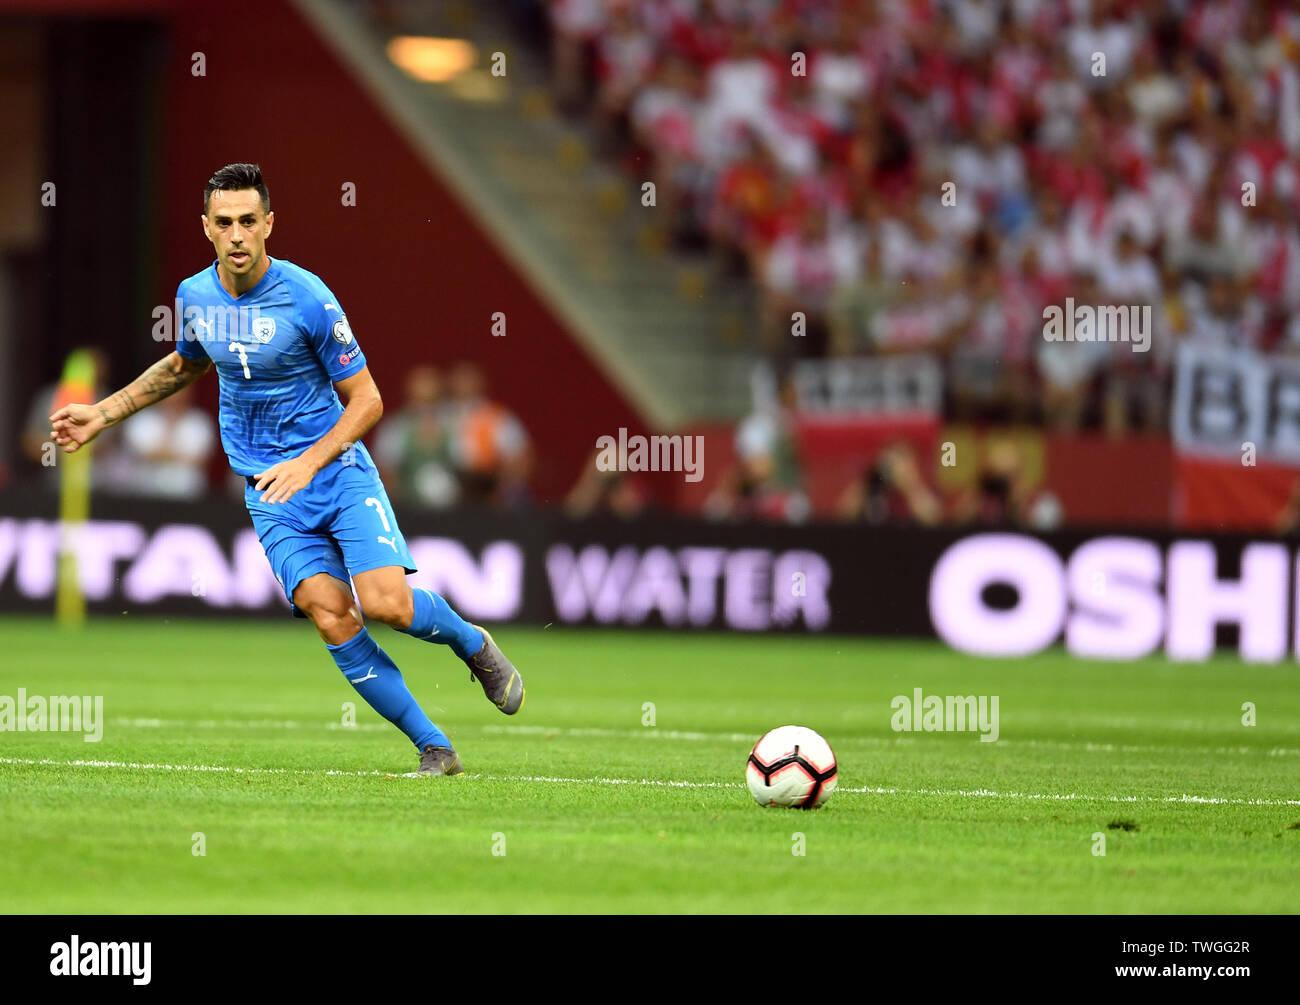 Warsaw, Poland, June 10, 2019: EURO 2020 qualifing round, group stage, Poland wins 4:0 with Izarel on PGE Narodowy. Eran Zahavi (Izrael) - Stock Image